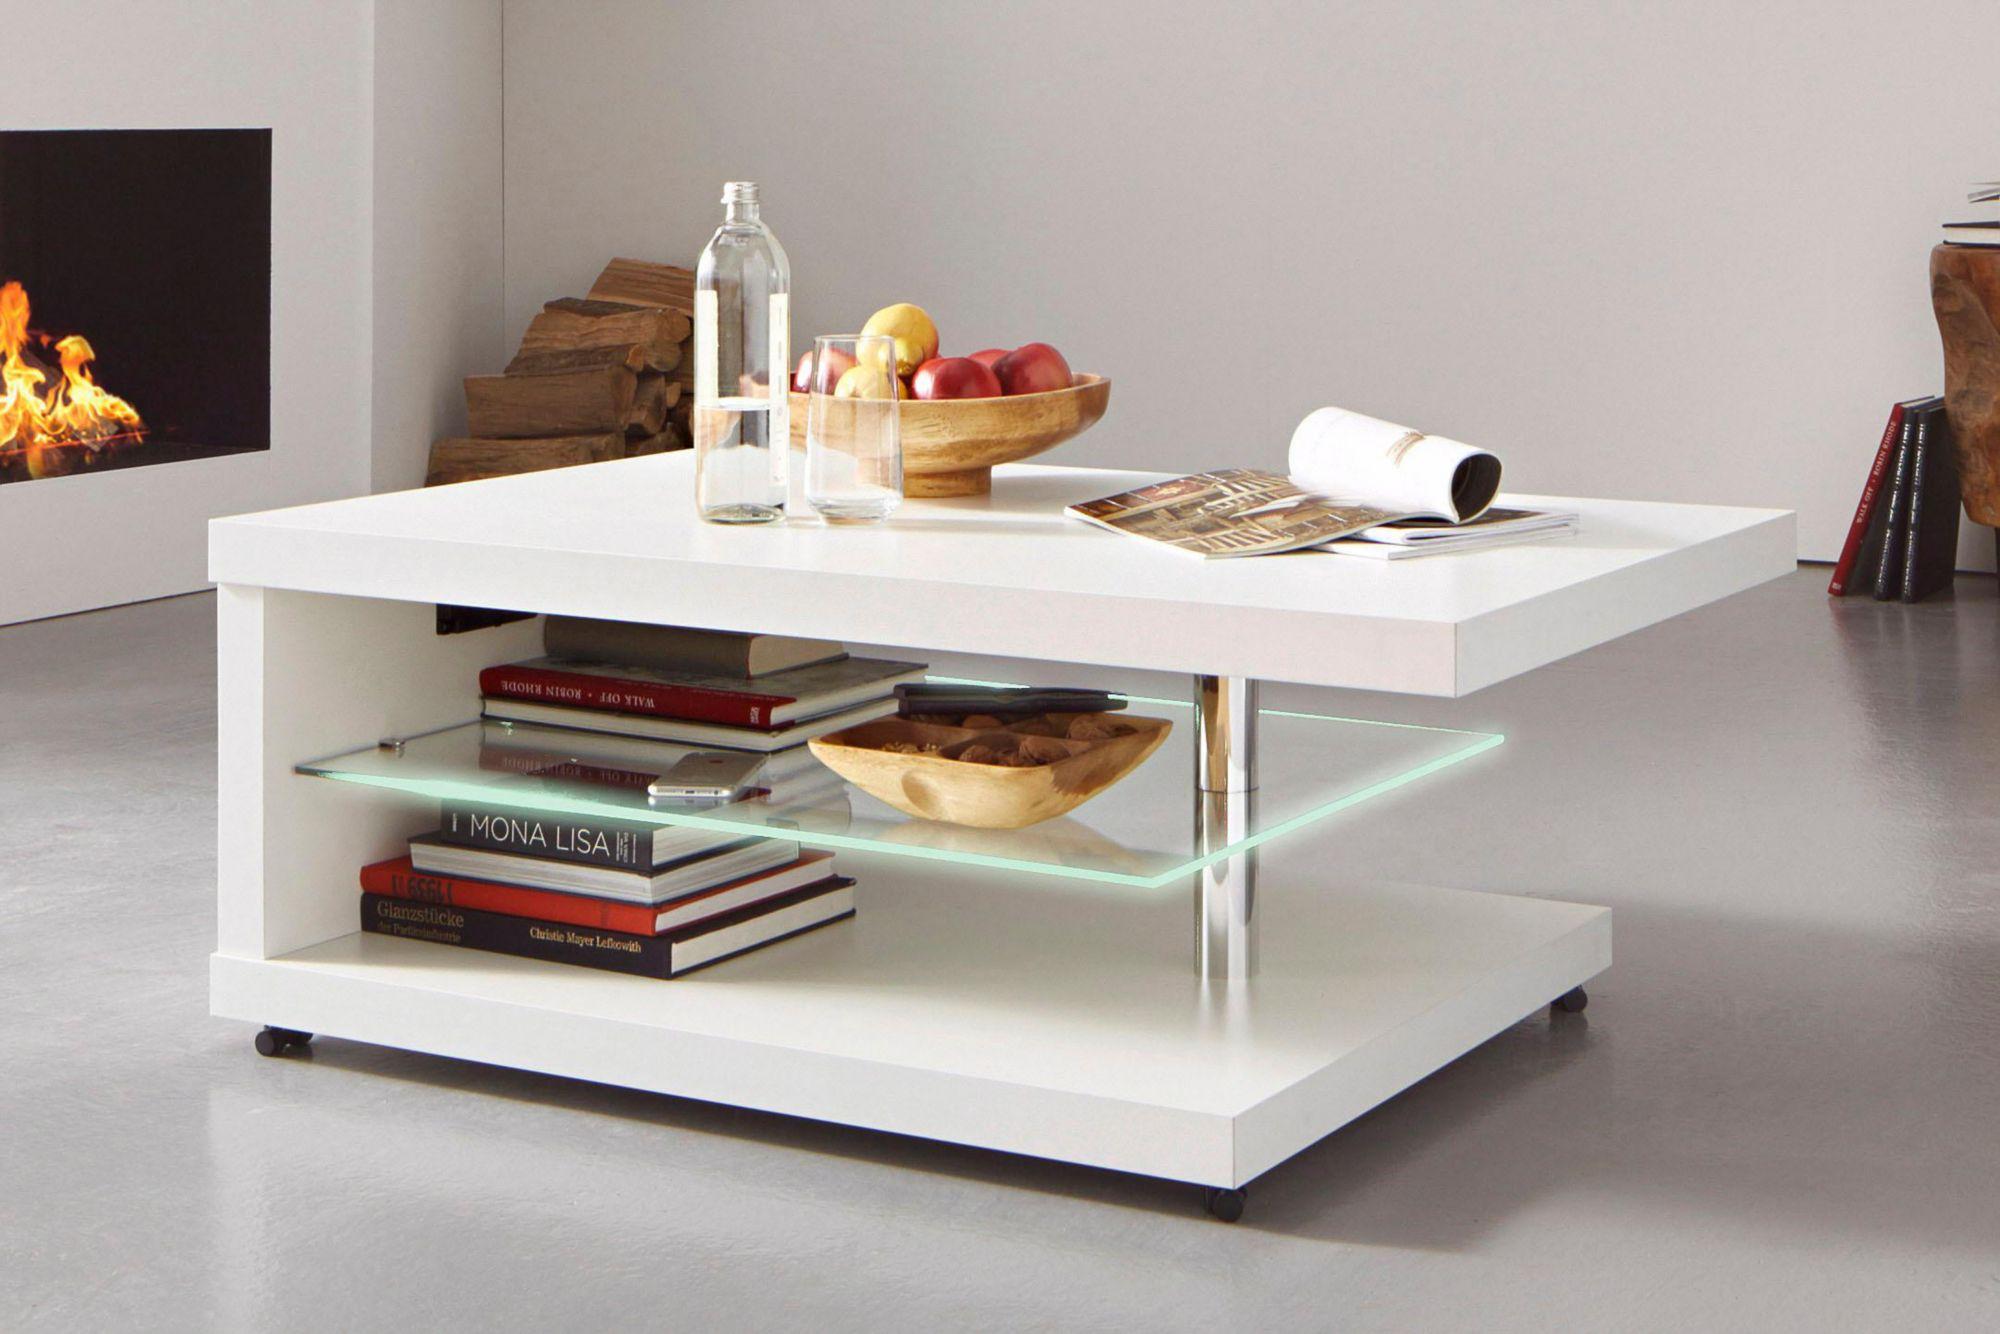 couchtisch mit led beleuchtung schwab versand eckige. Black Bedroom Furniture Sets. Home Design Ideas